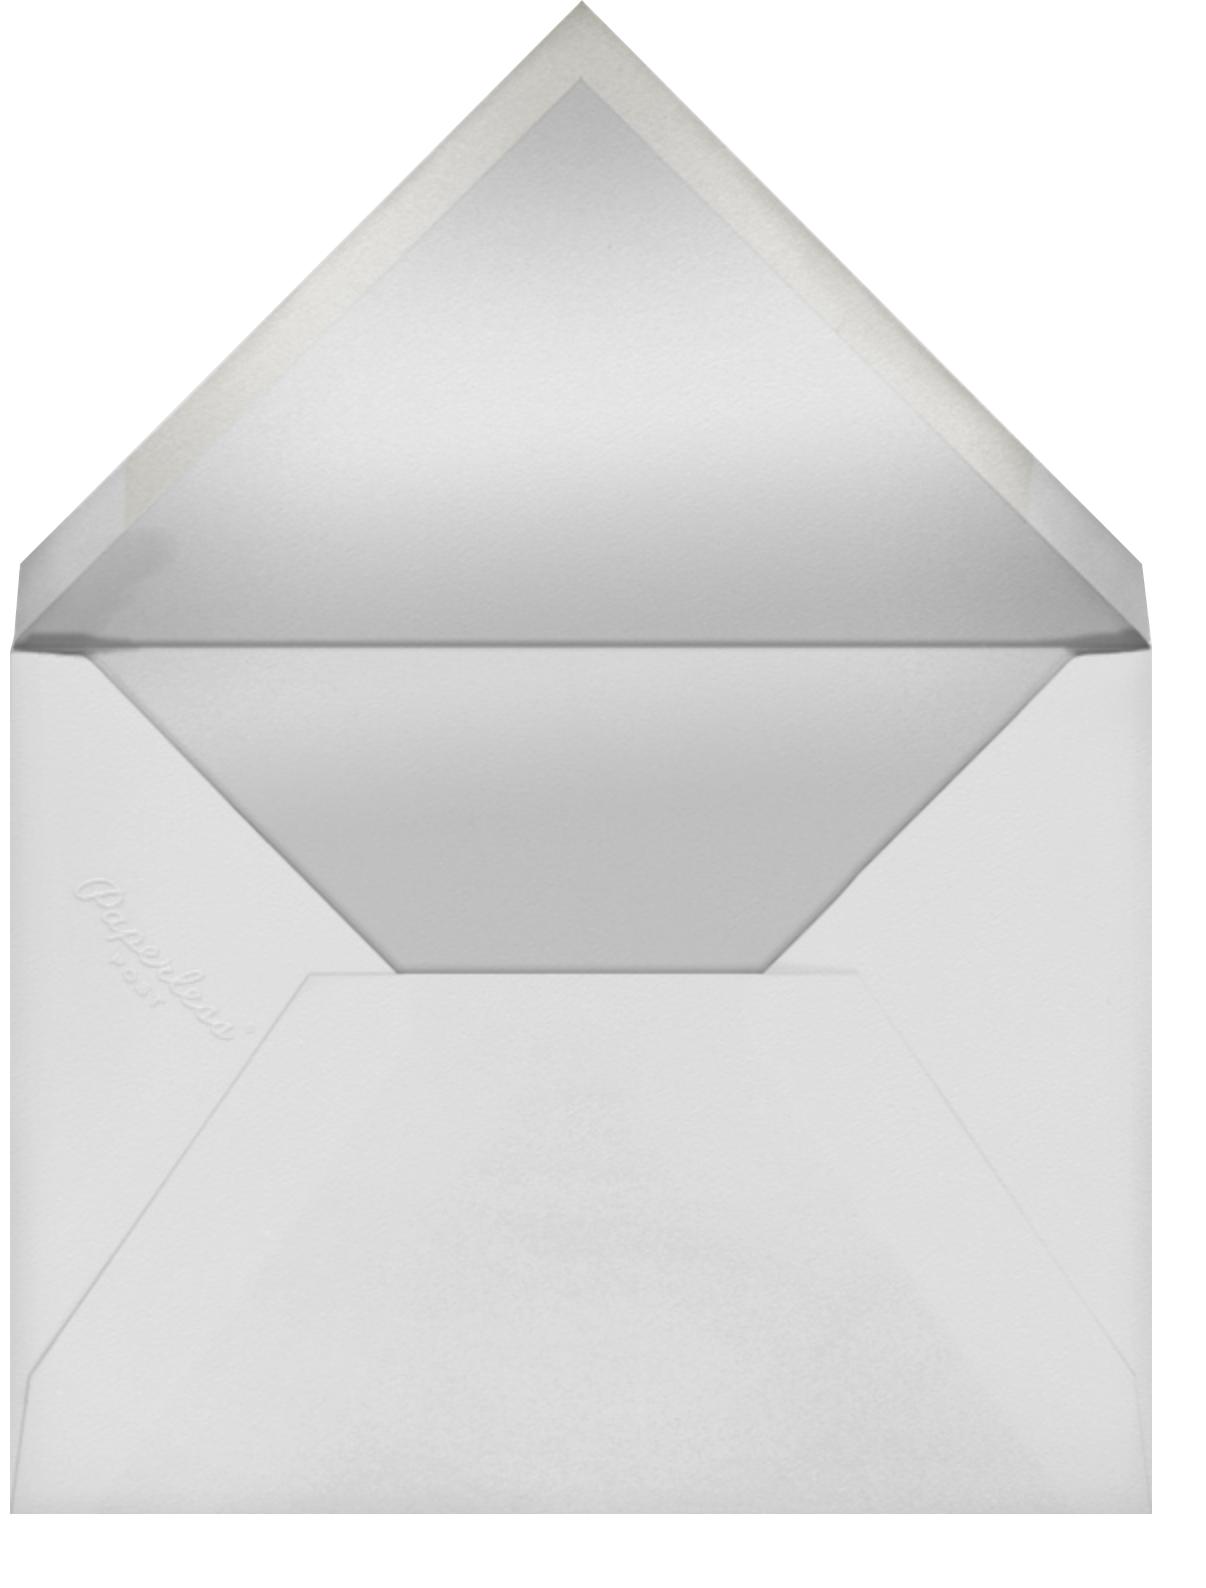 August Herbarium (Menu) - Rifle Paper Co. - Menus - envelope back